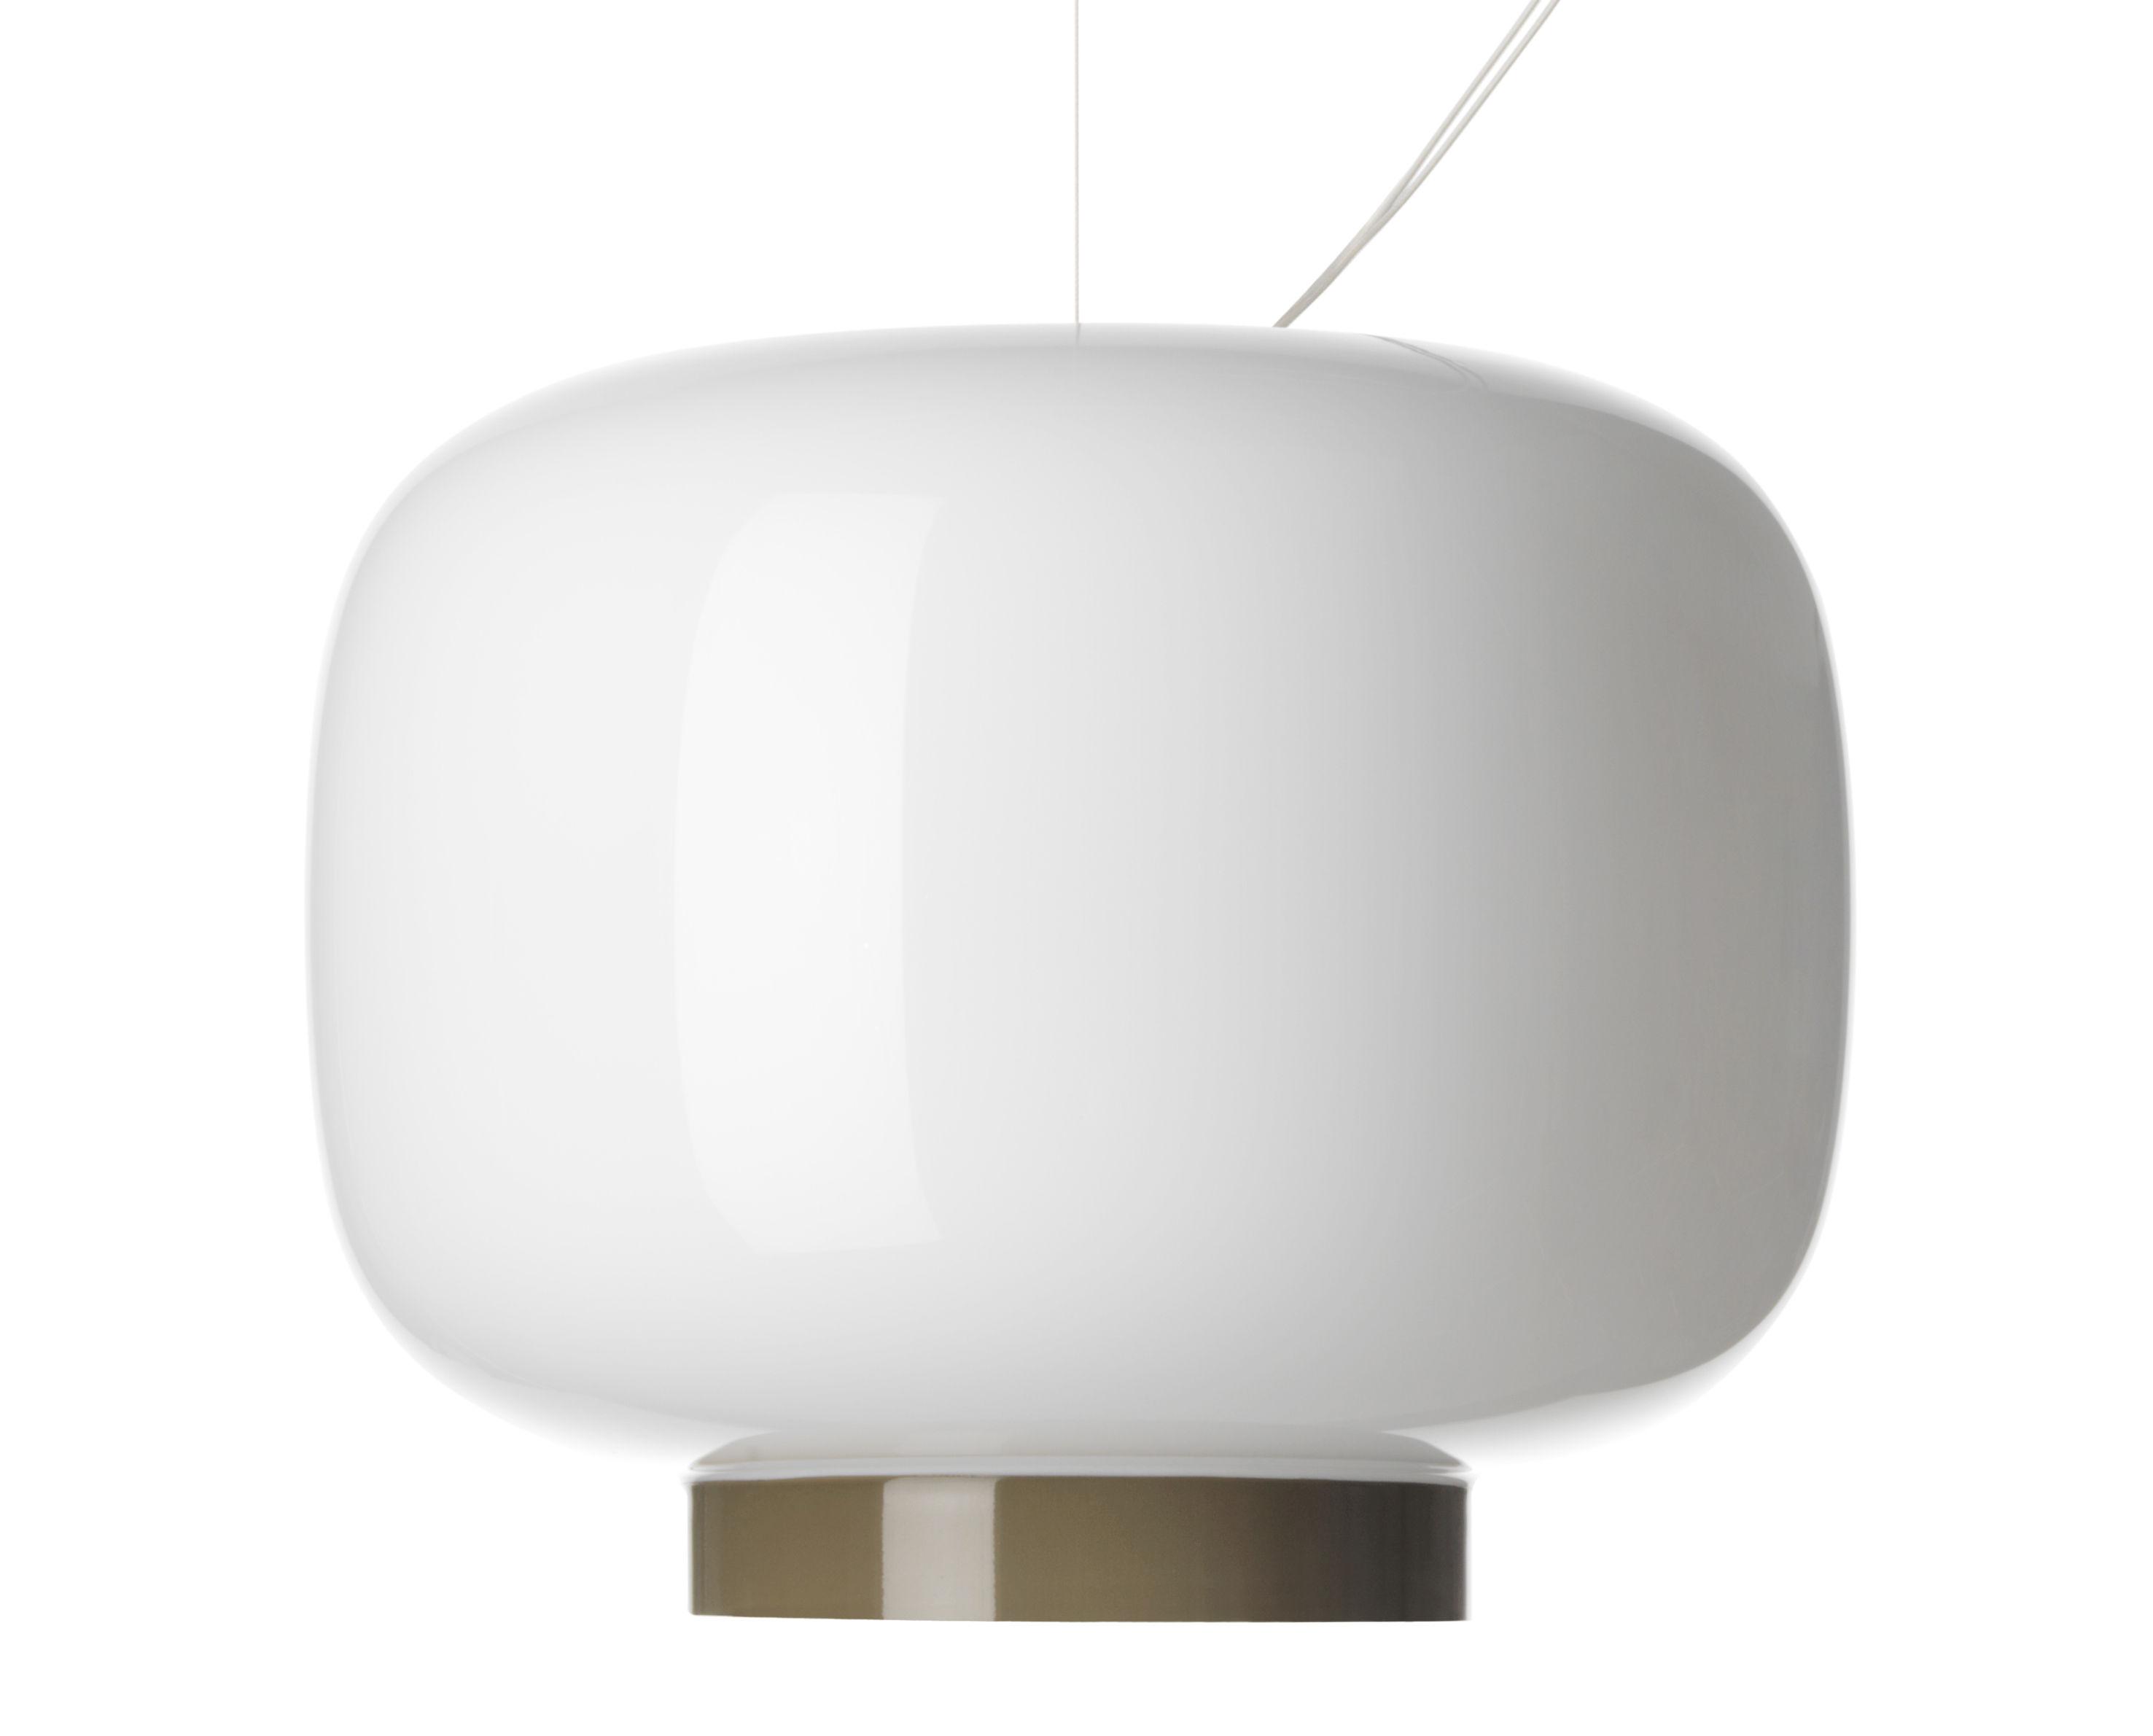 Illuminazione - Lampadari - Sospensione Chouchin Reverse n°3 / Ø 30 cm x H 25 cm - Foscarini - Bianco / Striscia grigia - Verre soufflé bouche laqué